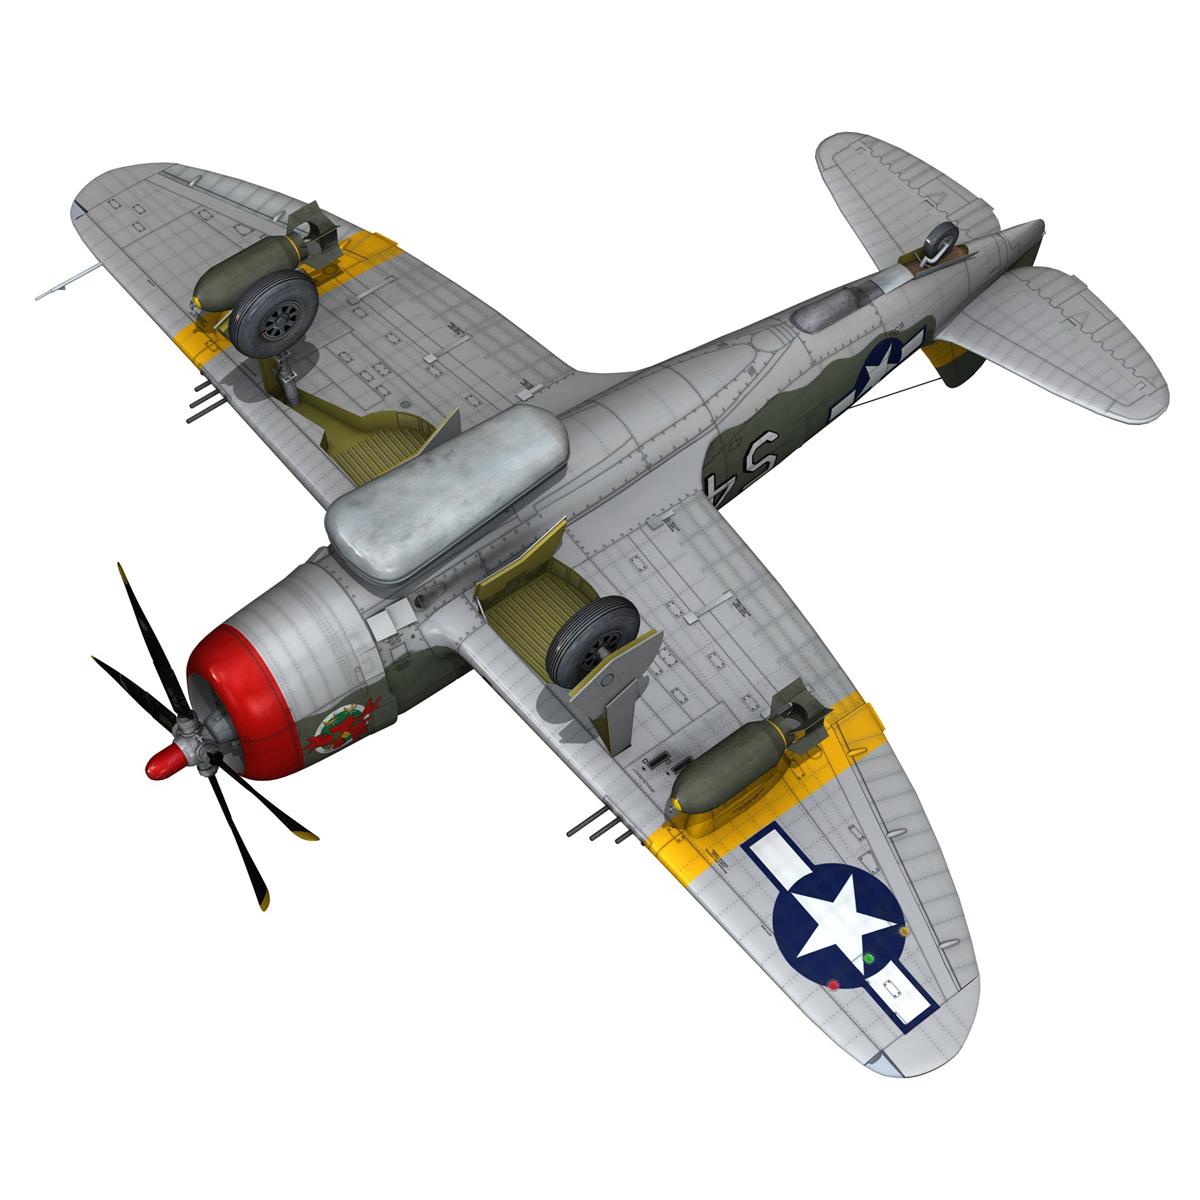 republic p-47d thunderbolt – little bunny 3d model fbx c4d lwo obj 274236